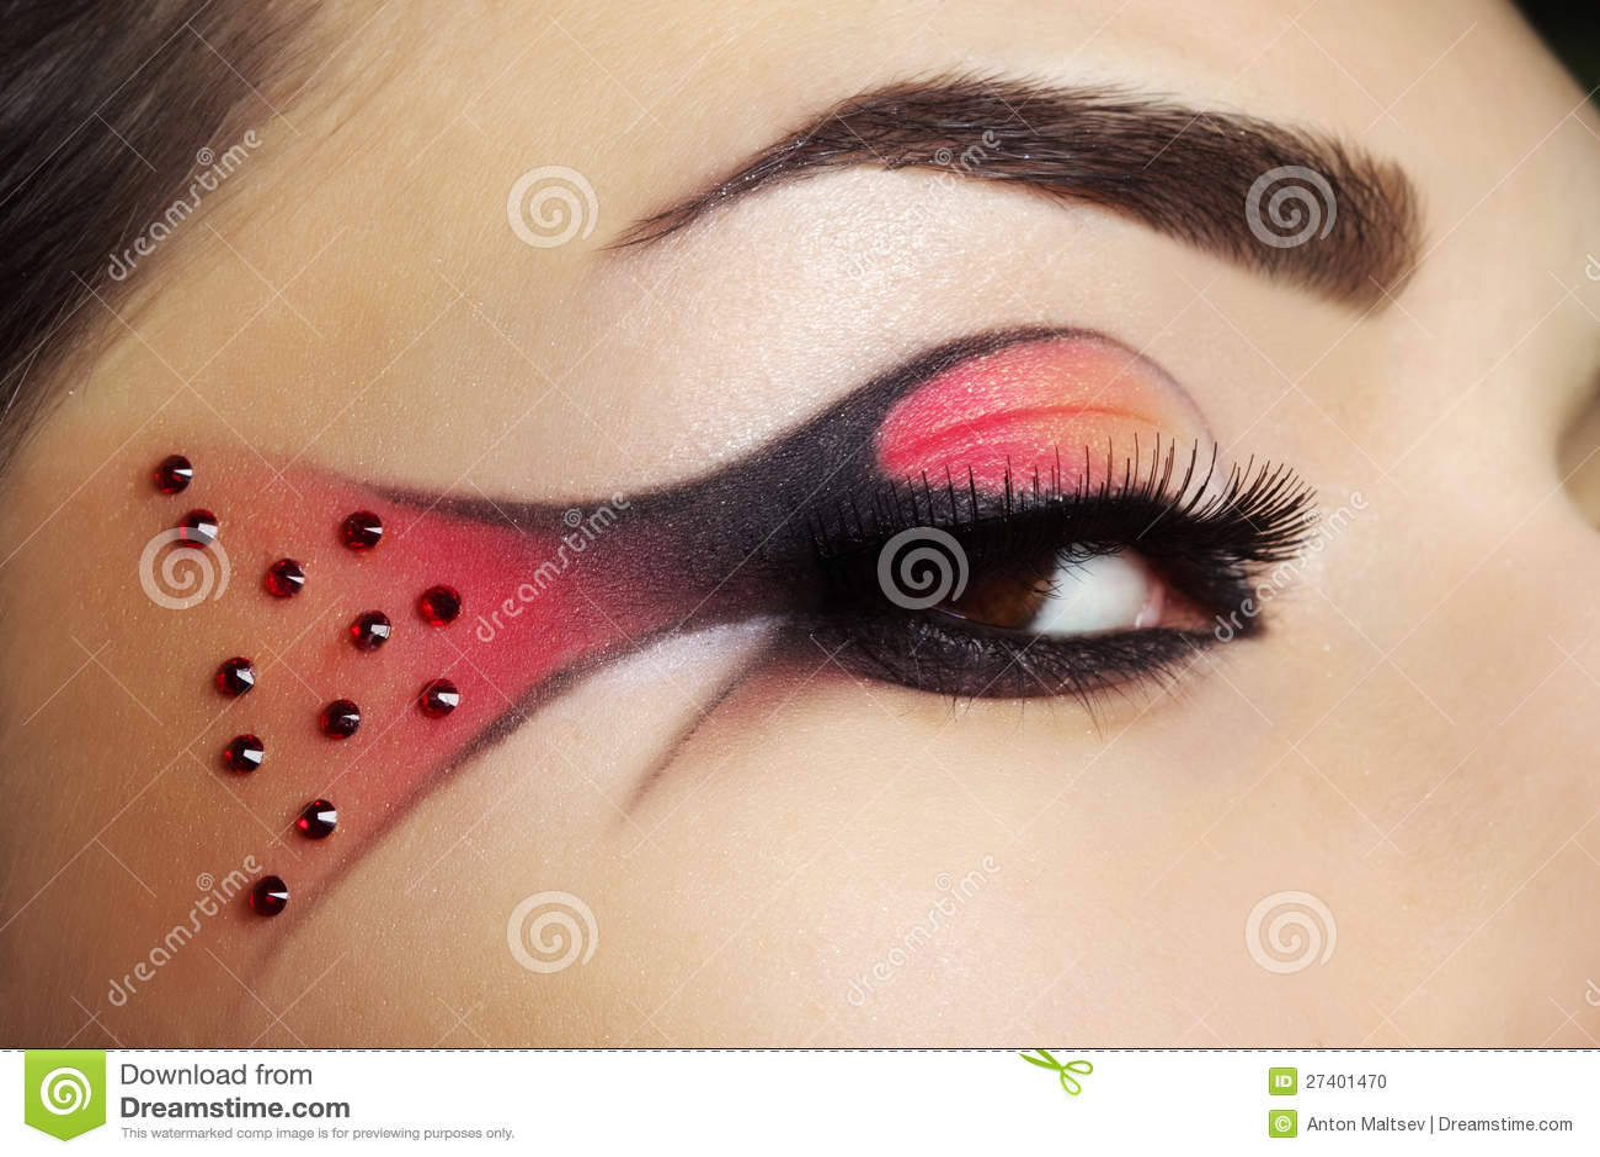 creative eye make-up stock photo. image of beautiful - 27401470